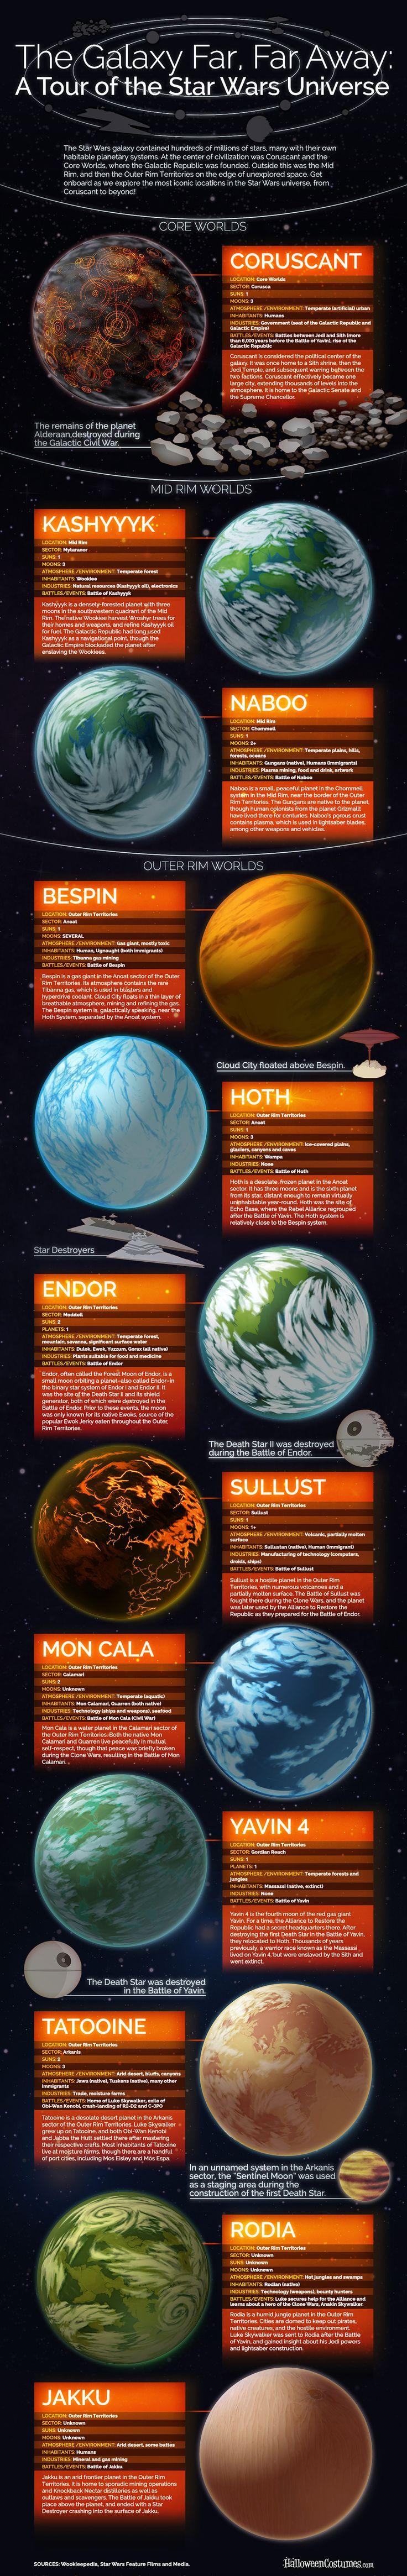 The Galaxy Far, Far Away: A Tour of the Star Wars Universe